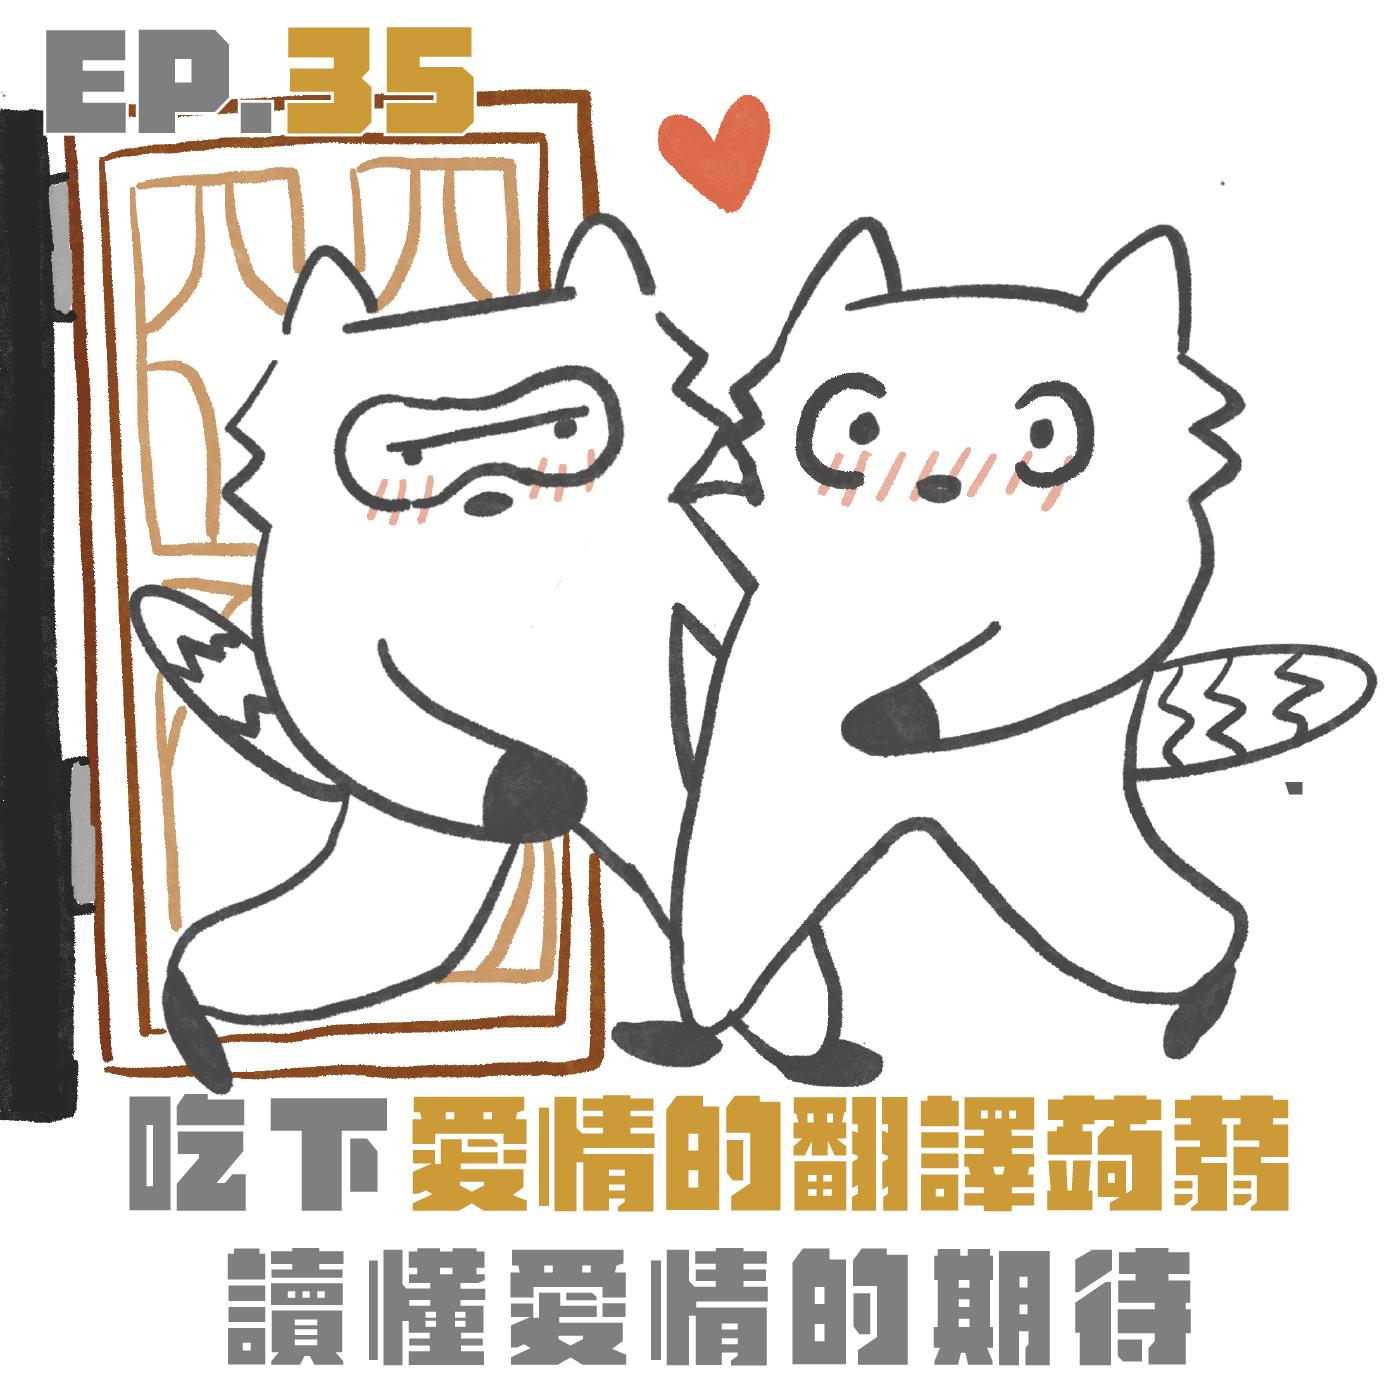 EP.35 吃下愛情翻譯蒟蒻,讀懂愛情的期待(feat. Tora)